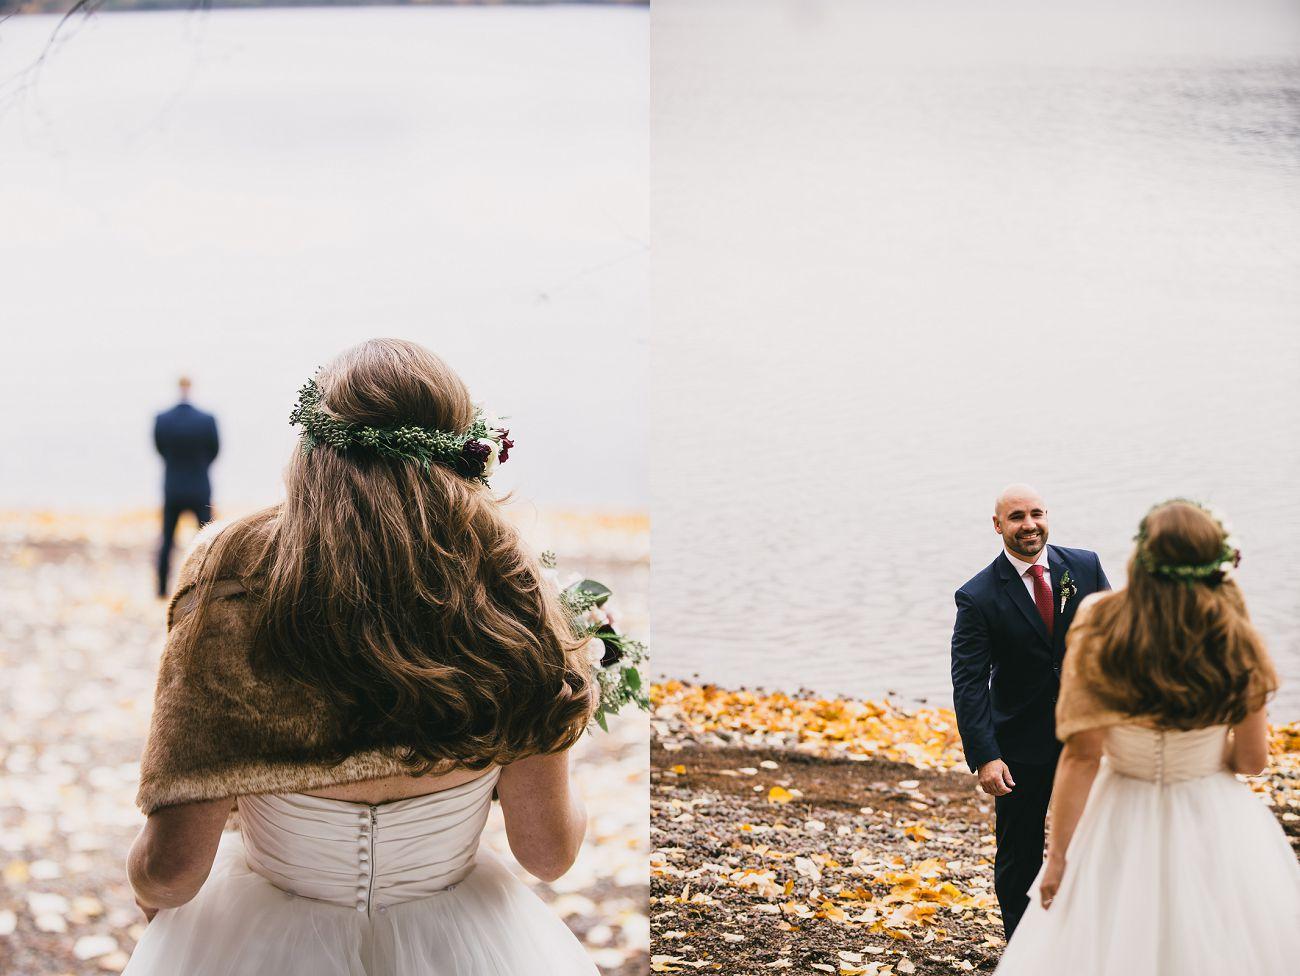 Jennifer_Mooney_Photo_Whitefish_mountain_resort_wedding_elegant_montana_wedding_028.jpg